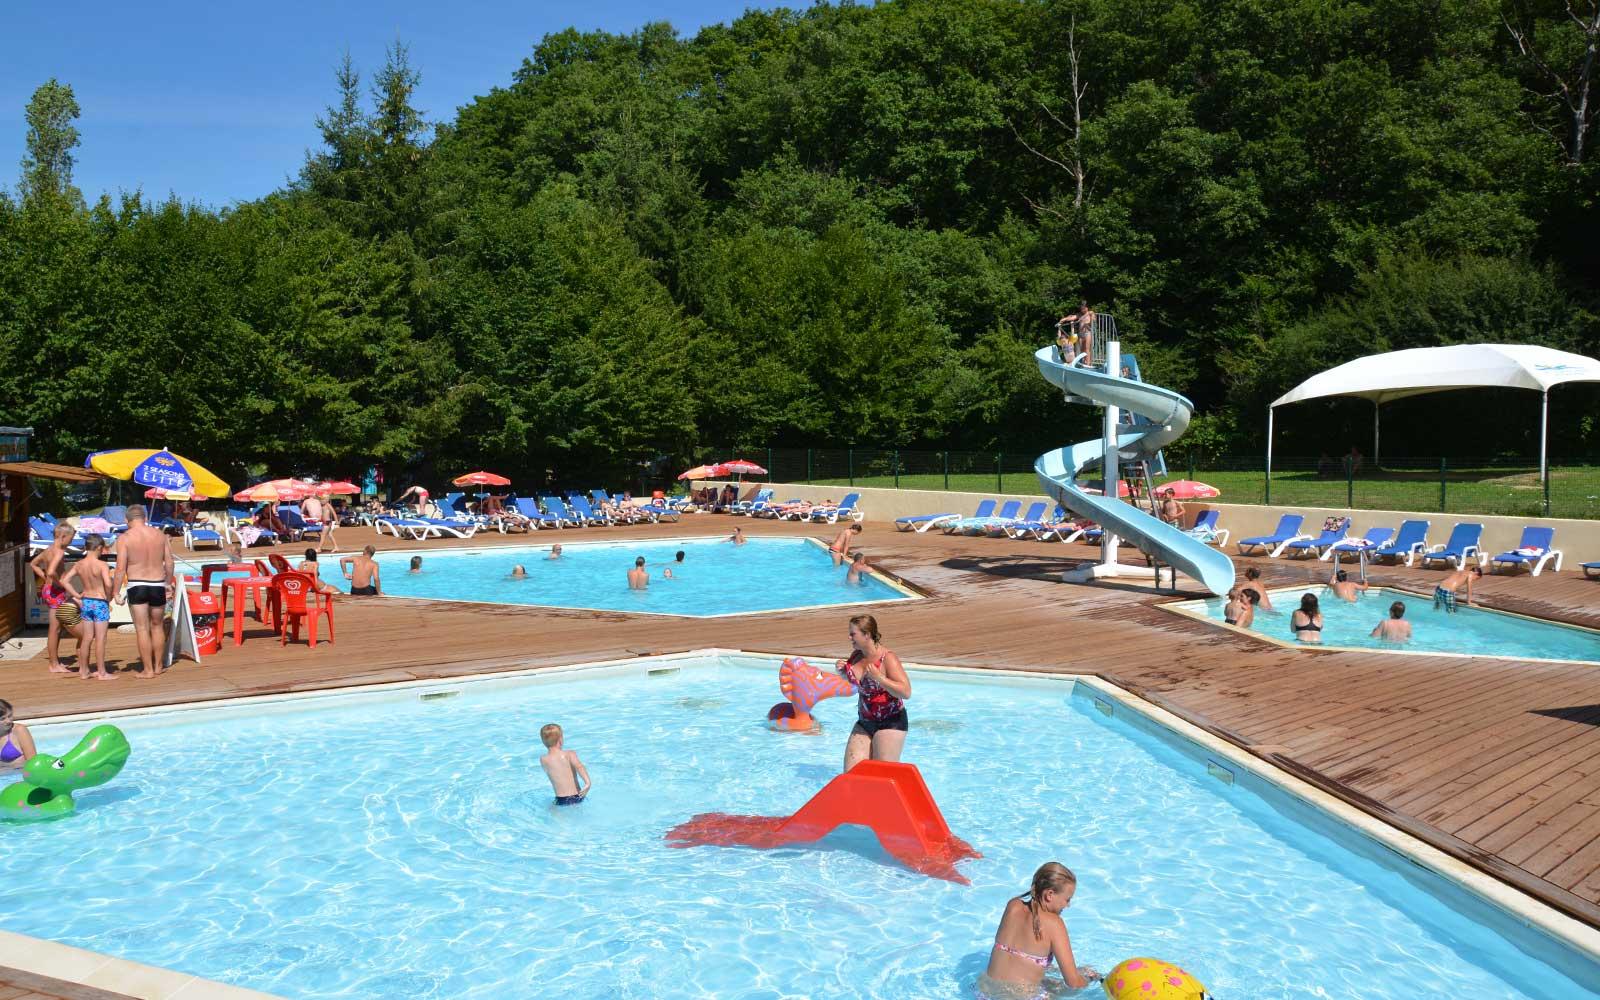 Piscine auxerre horaires horaires piscine with piscine for Piscine de boulogne billancourt horaires